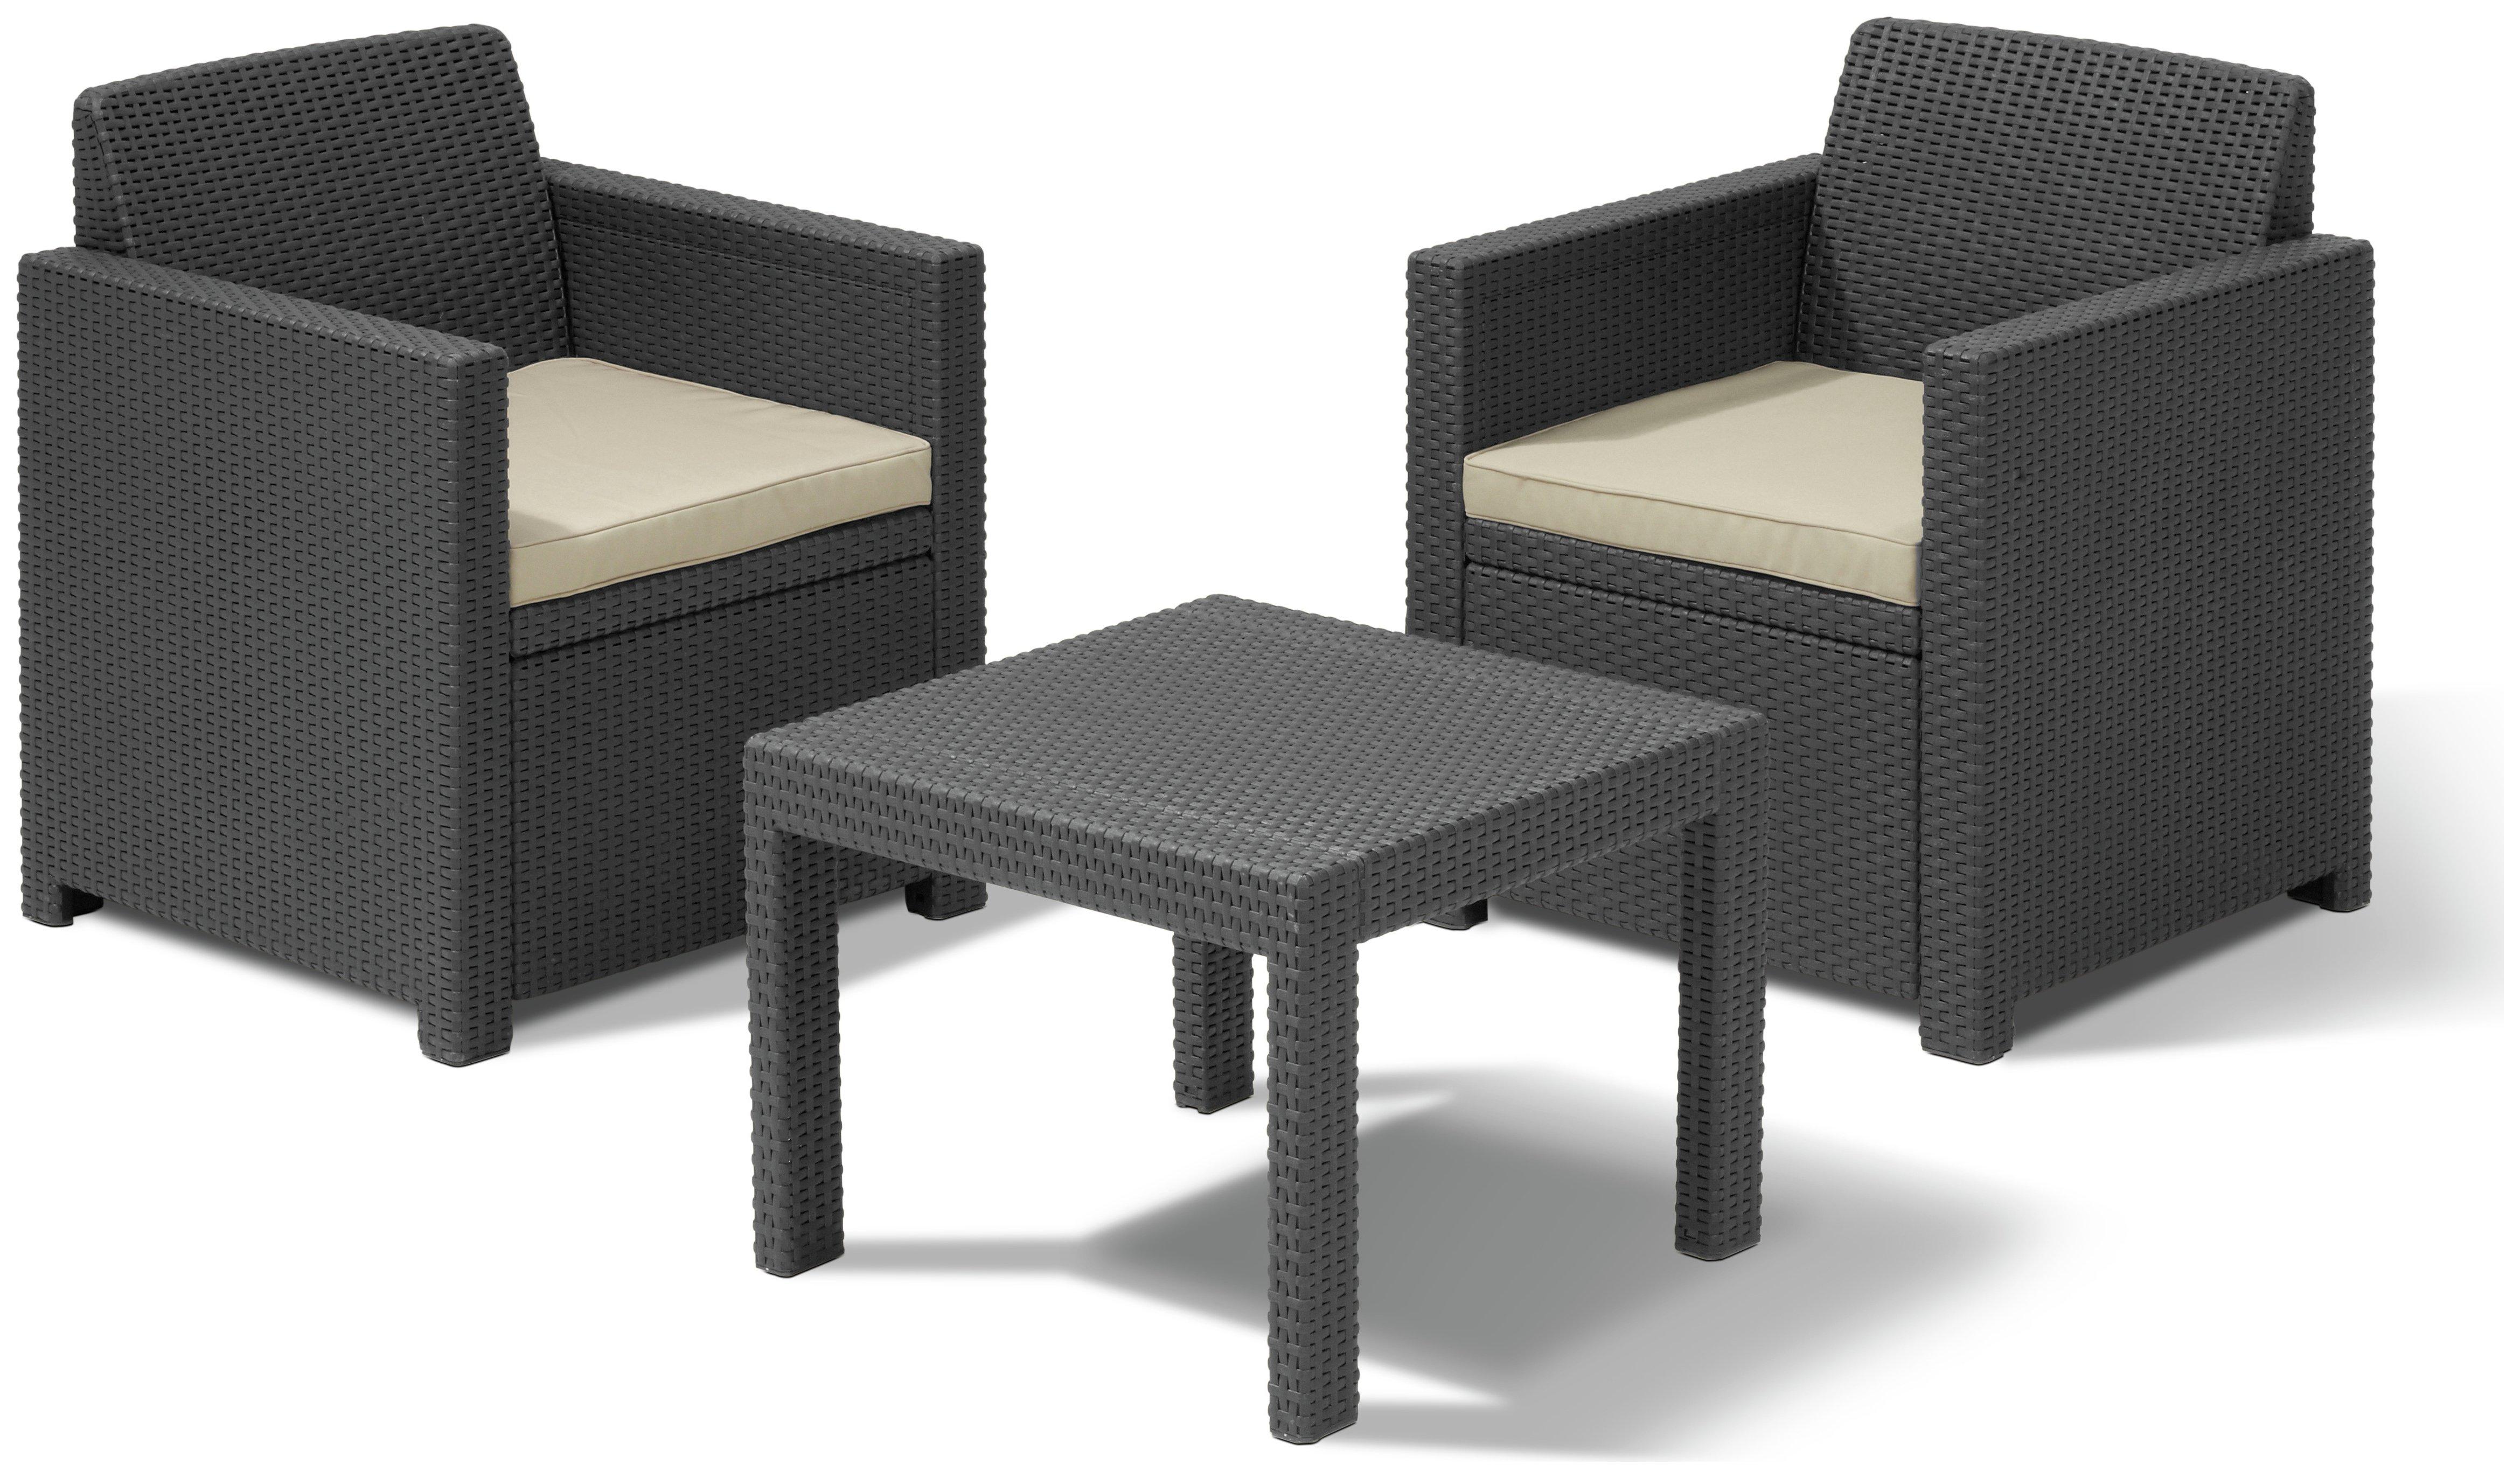 Комплект мебели для балкона keter allegro balcony set - kete.